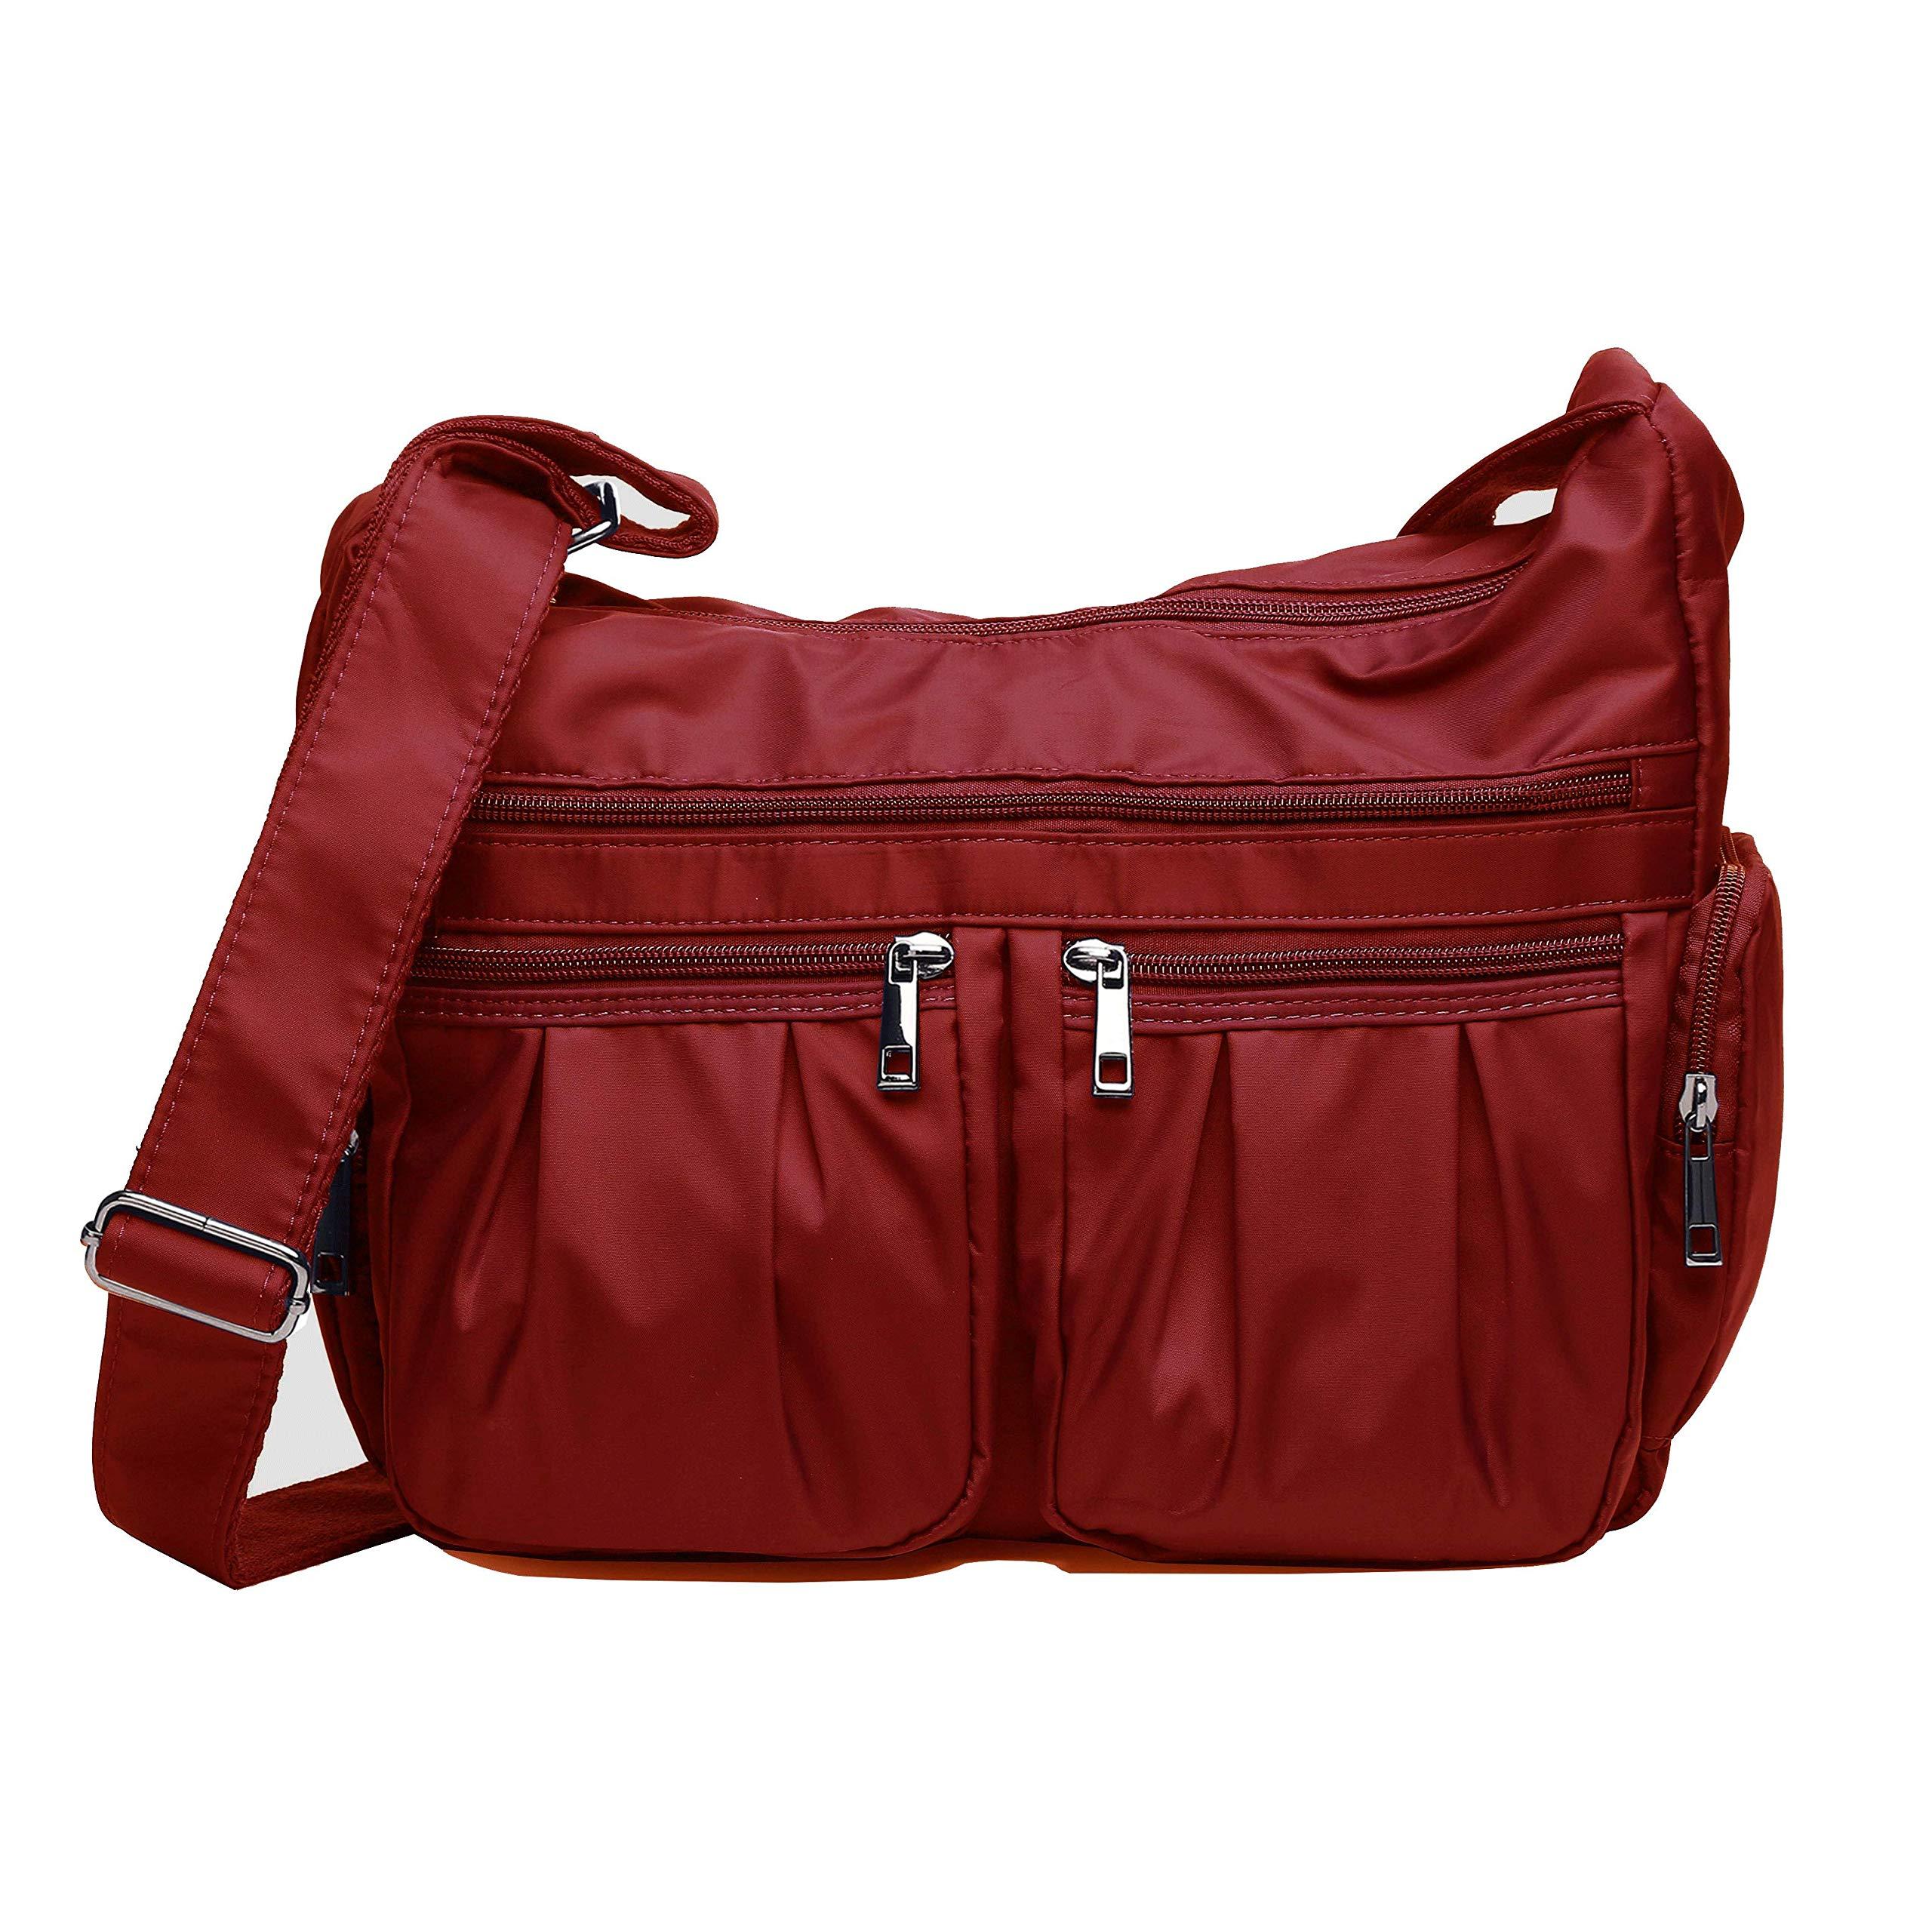 Crossbody Bags for Women, Multi Pocket Shoulder Bag Waterproof Nylon Travel Purses and Handbags (8981_Red)